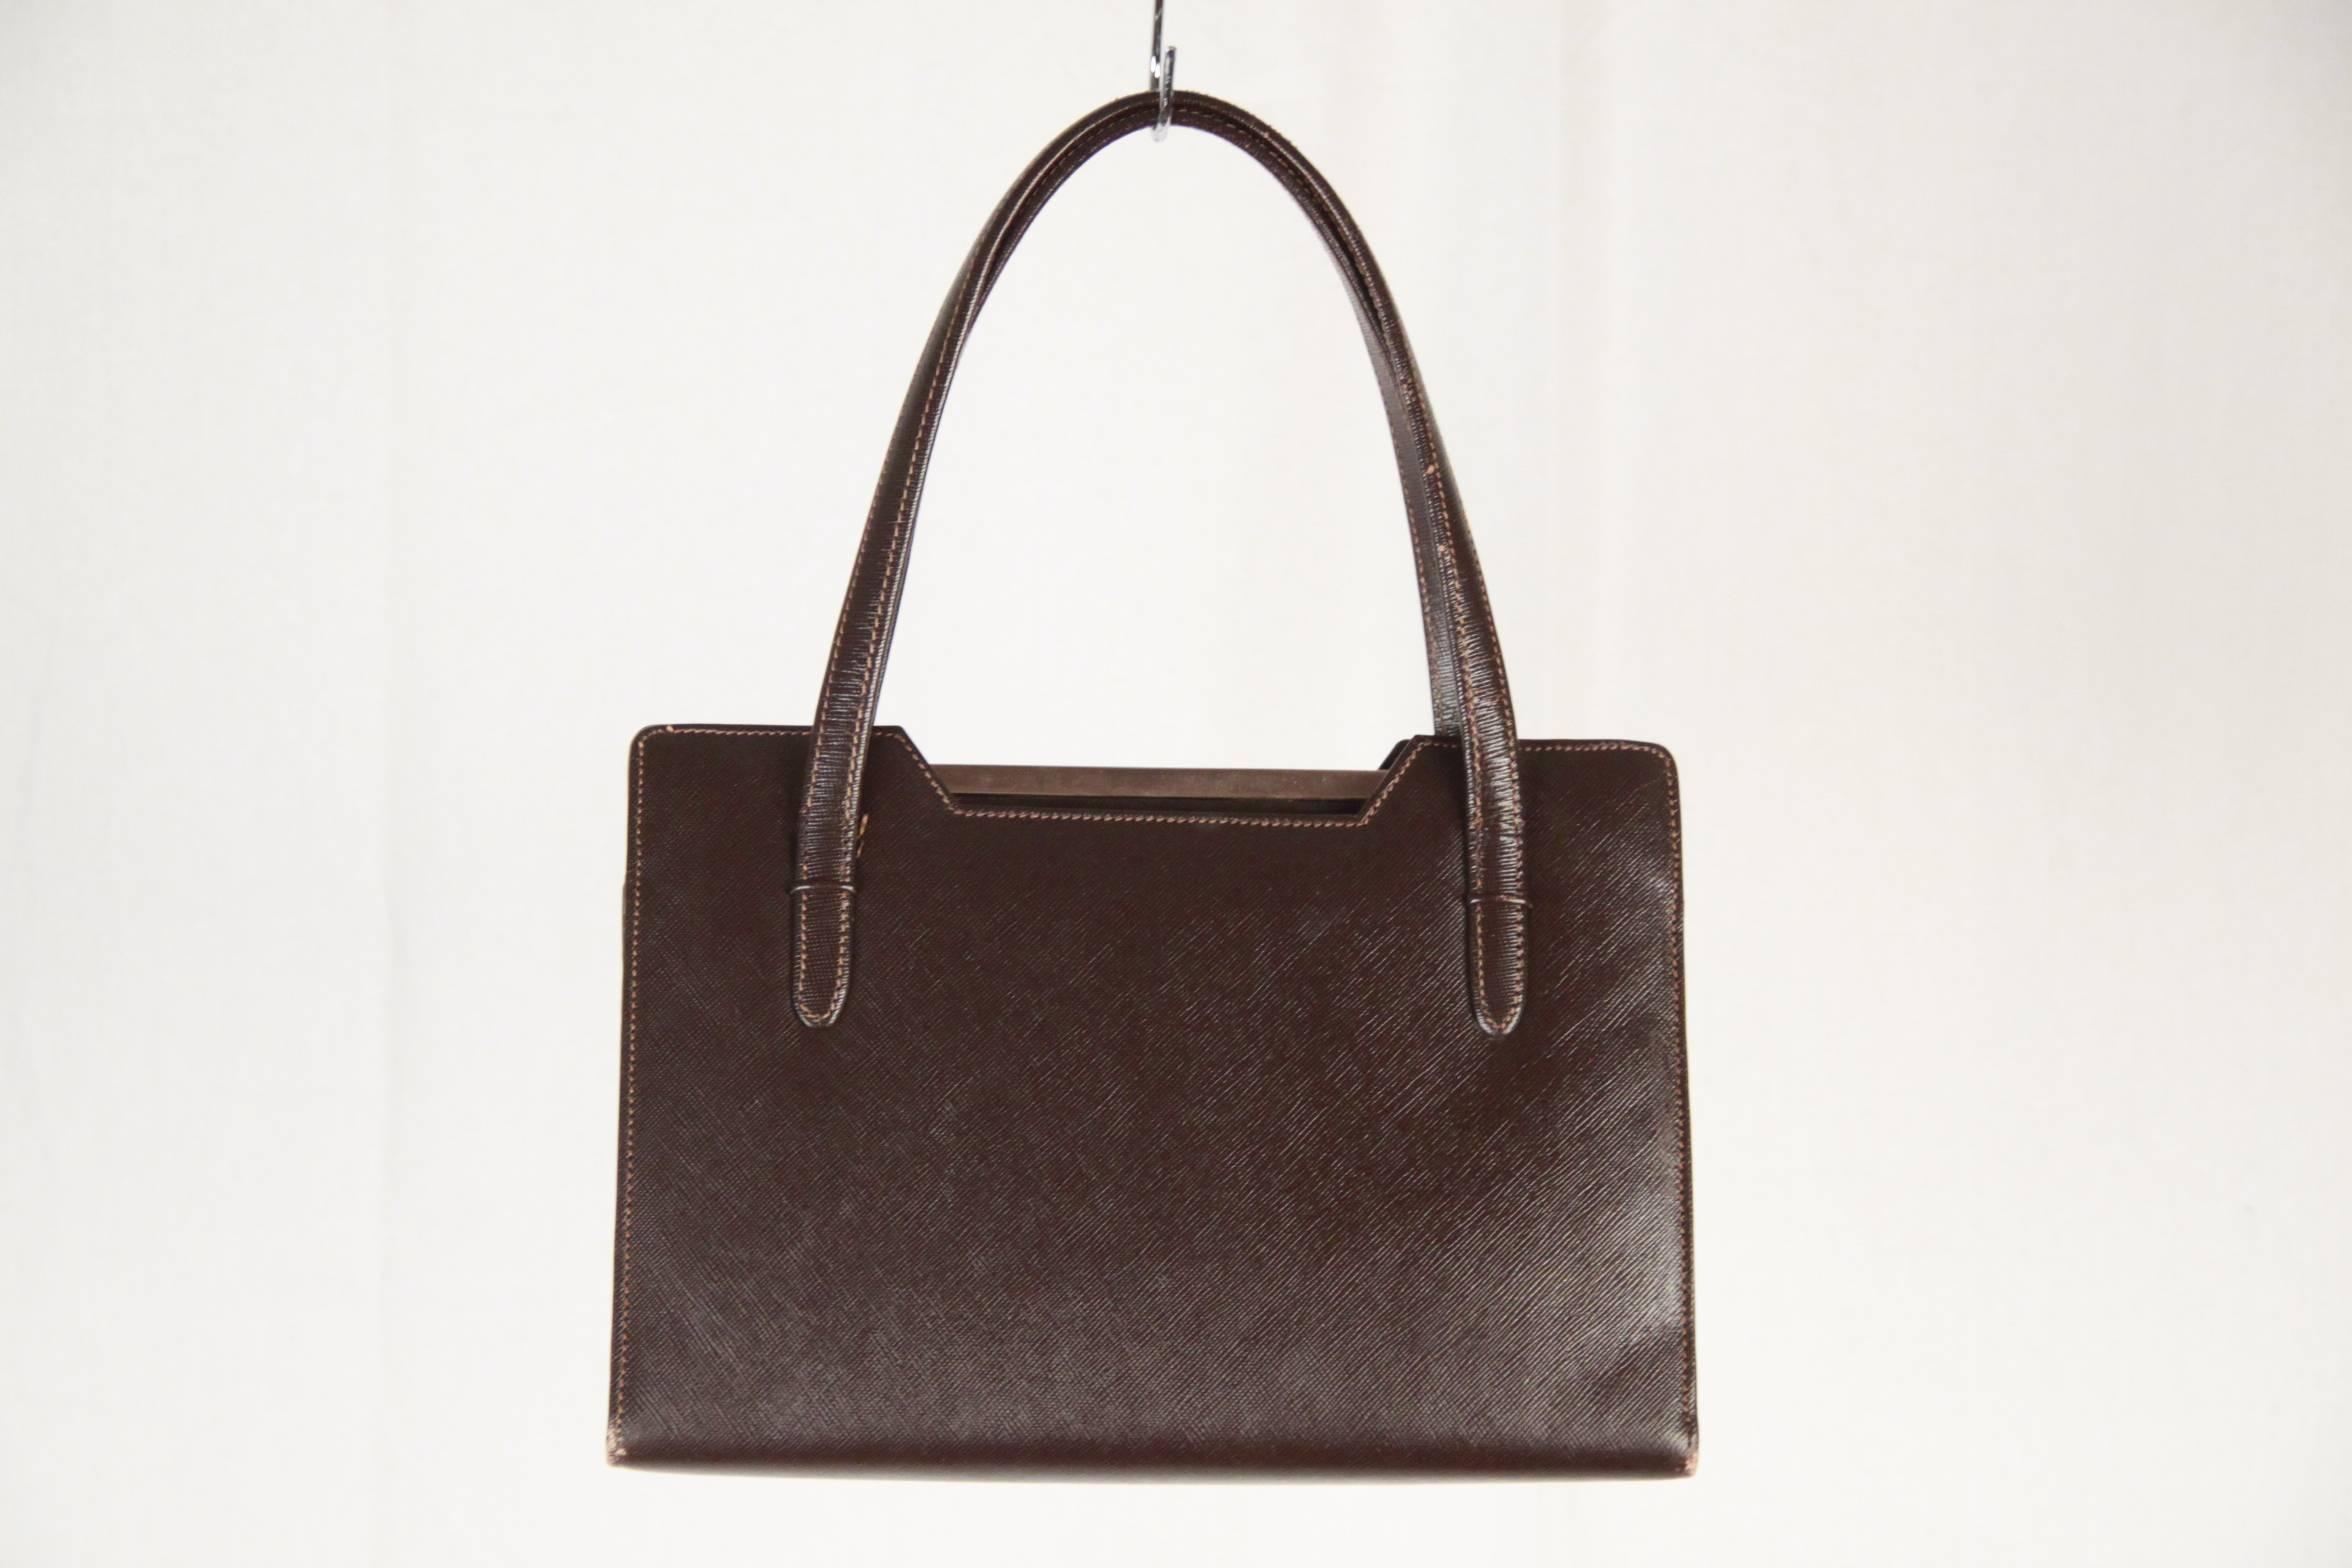 e1f87176efe Gucci Vintage Brown Leather Handbag Top Handles Bag at 1stdibs